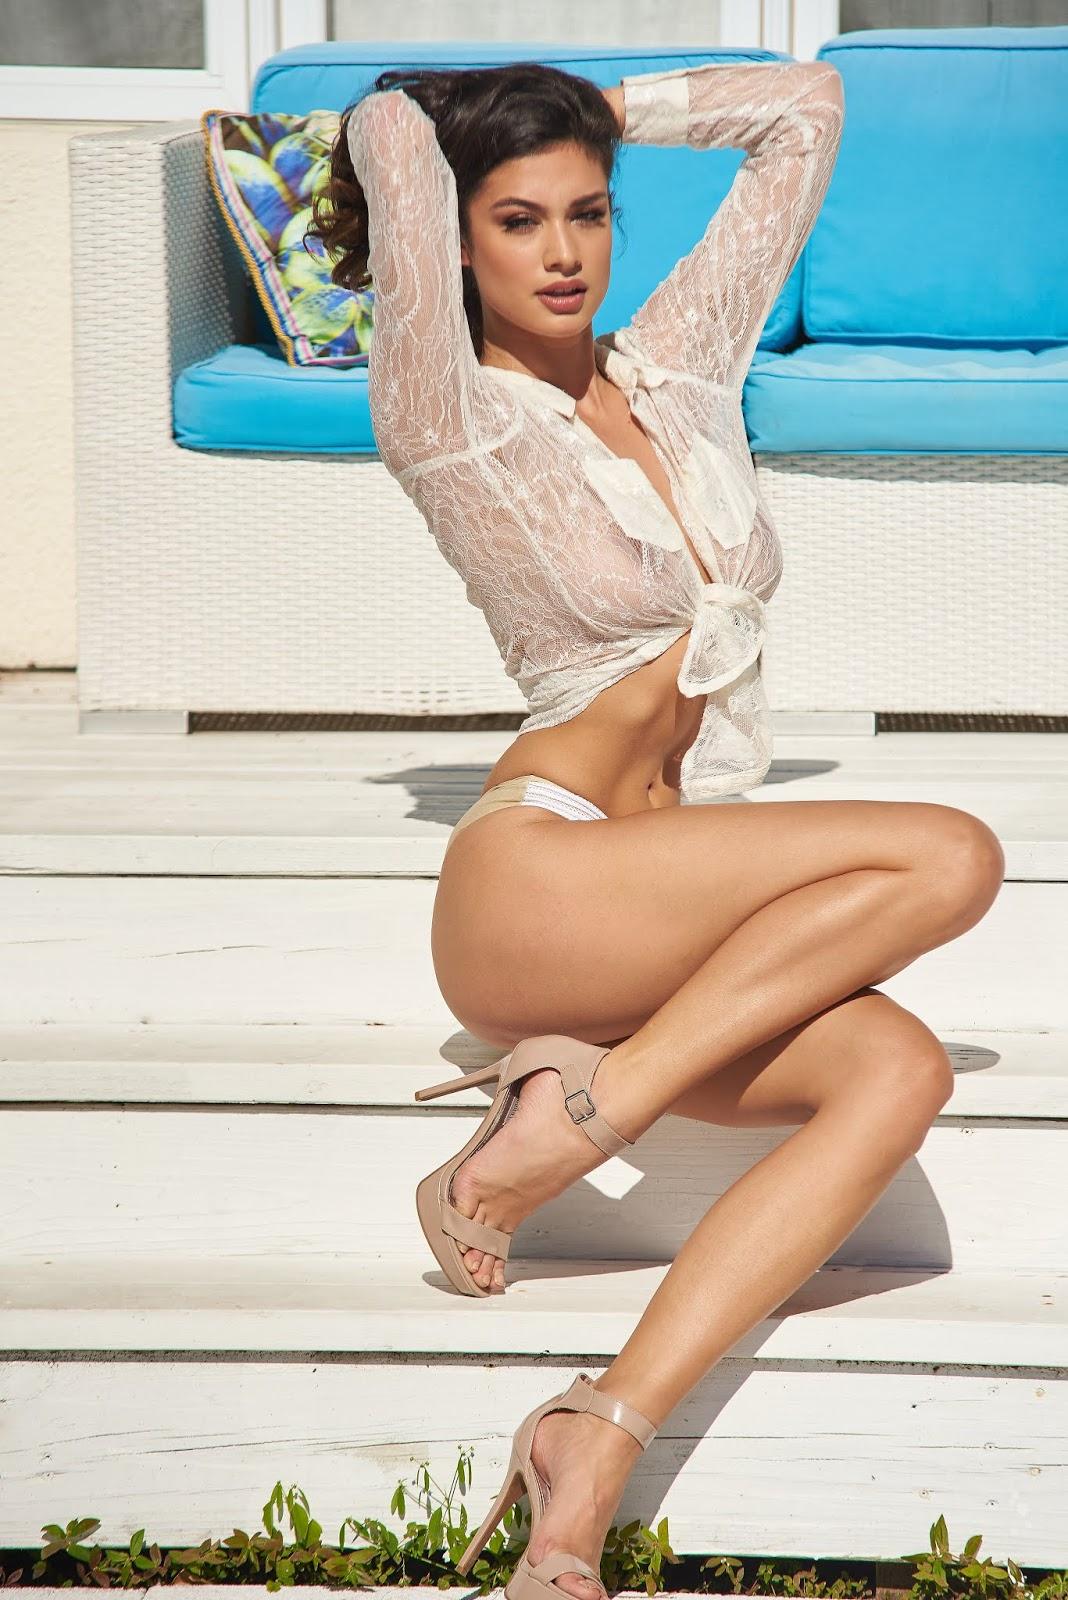 Celebrity Alex Hanson nudes (92 photo), Tits, Bikini, Feet, butt 2006